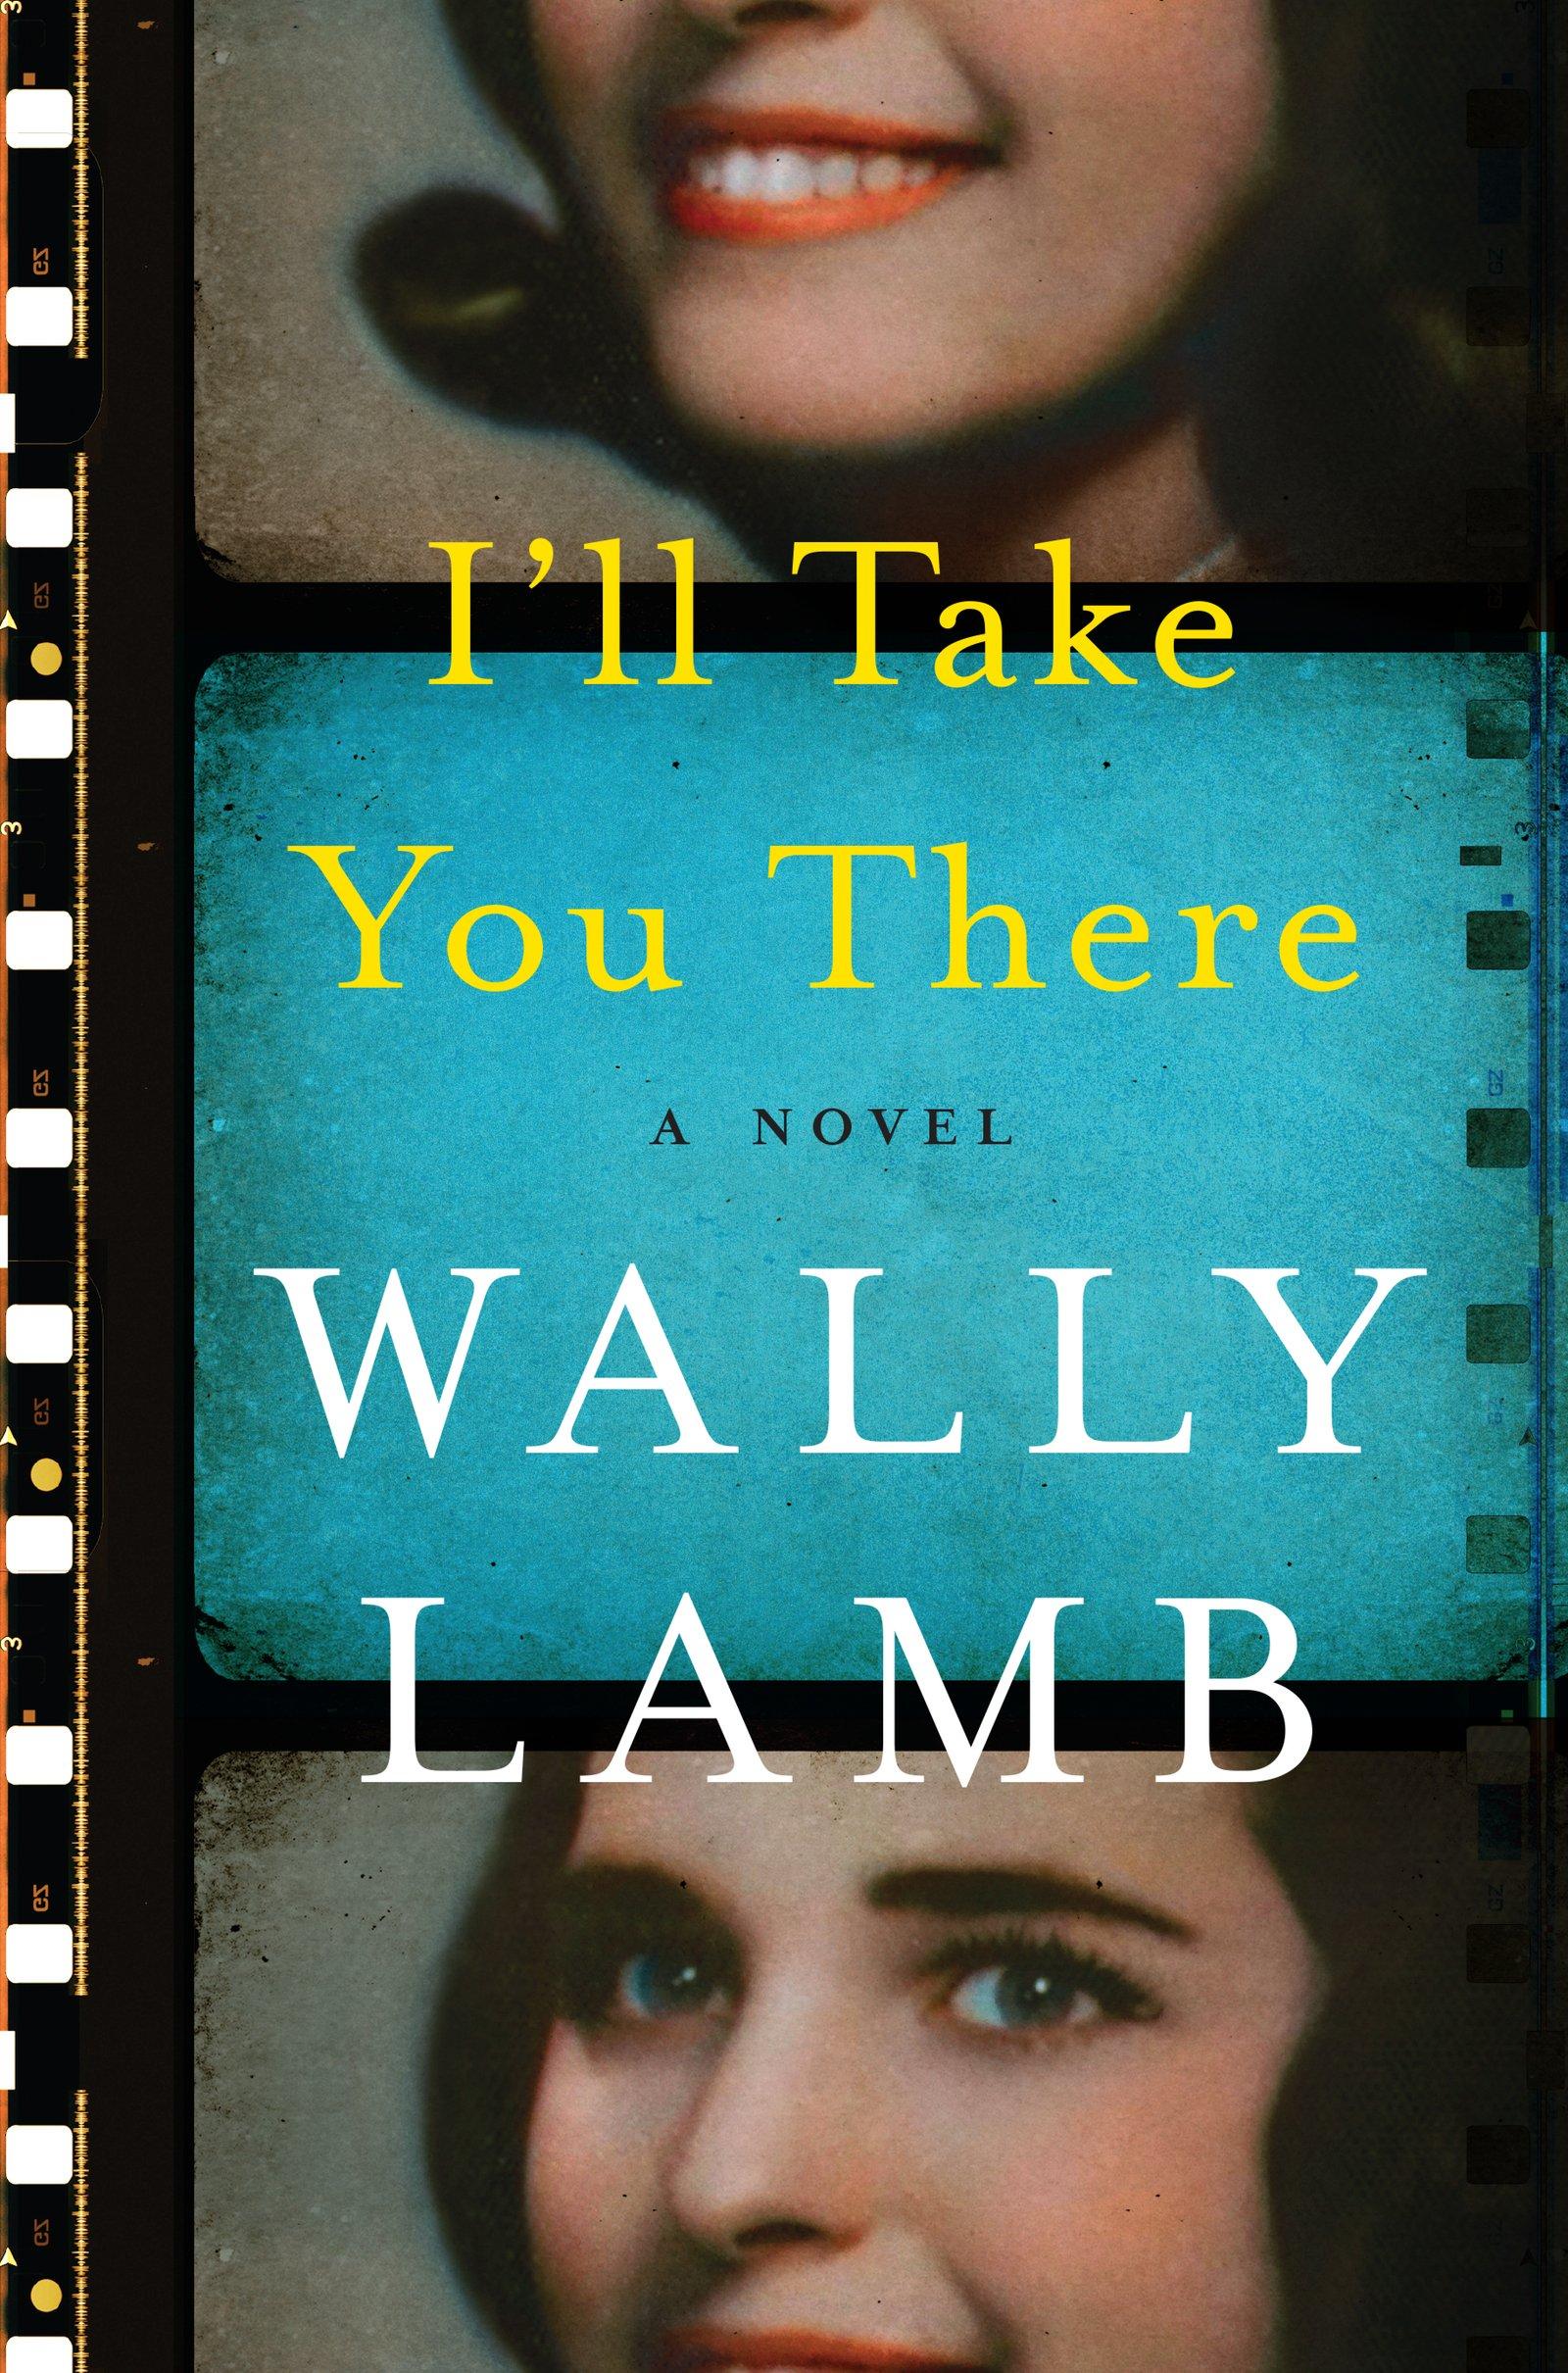 Wally Lamb - I'll Take You There